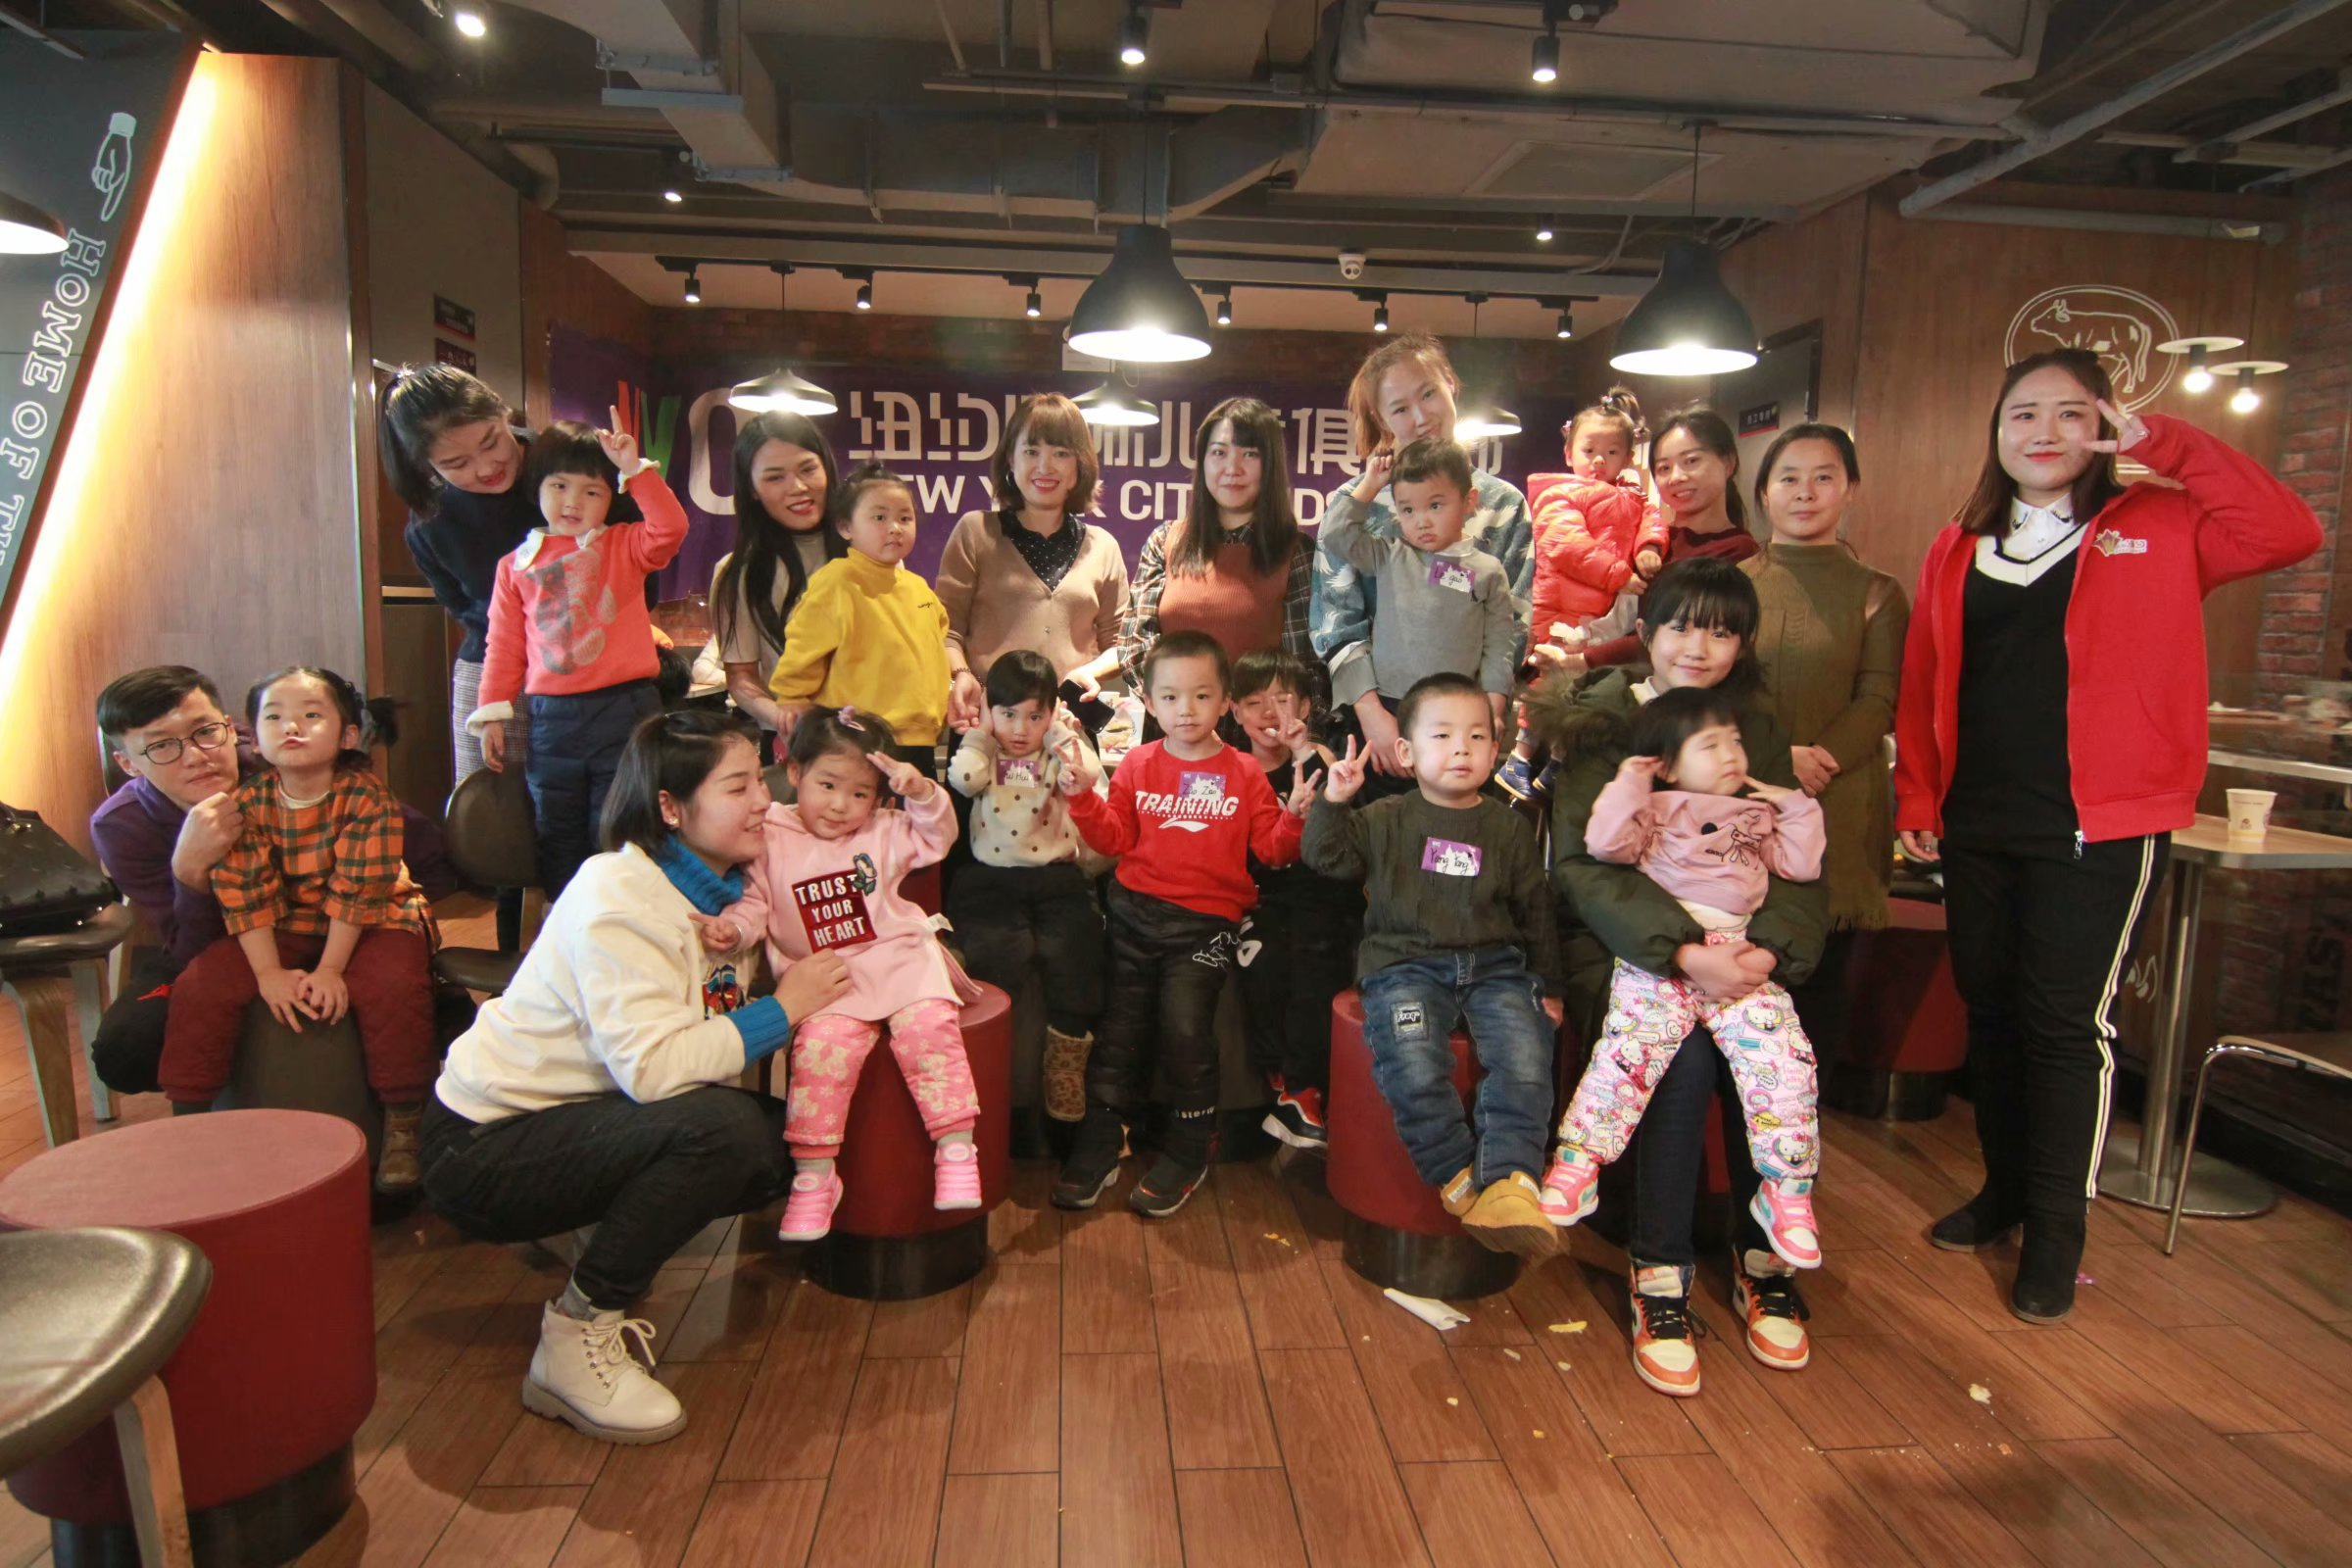 NYC纽约国际乌鲁木齐万达中心:大快朵颐的欢乐时光—NYC宝贝们的汉堡DIY活动回顾